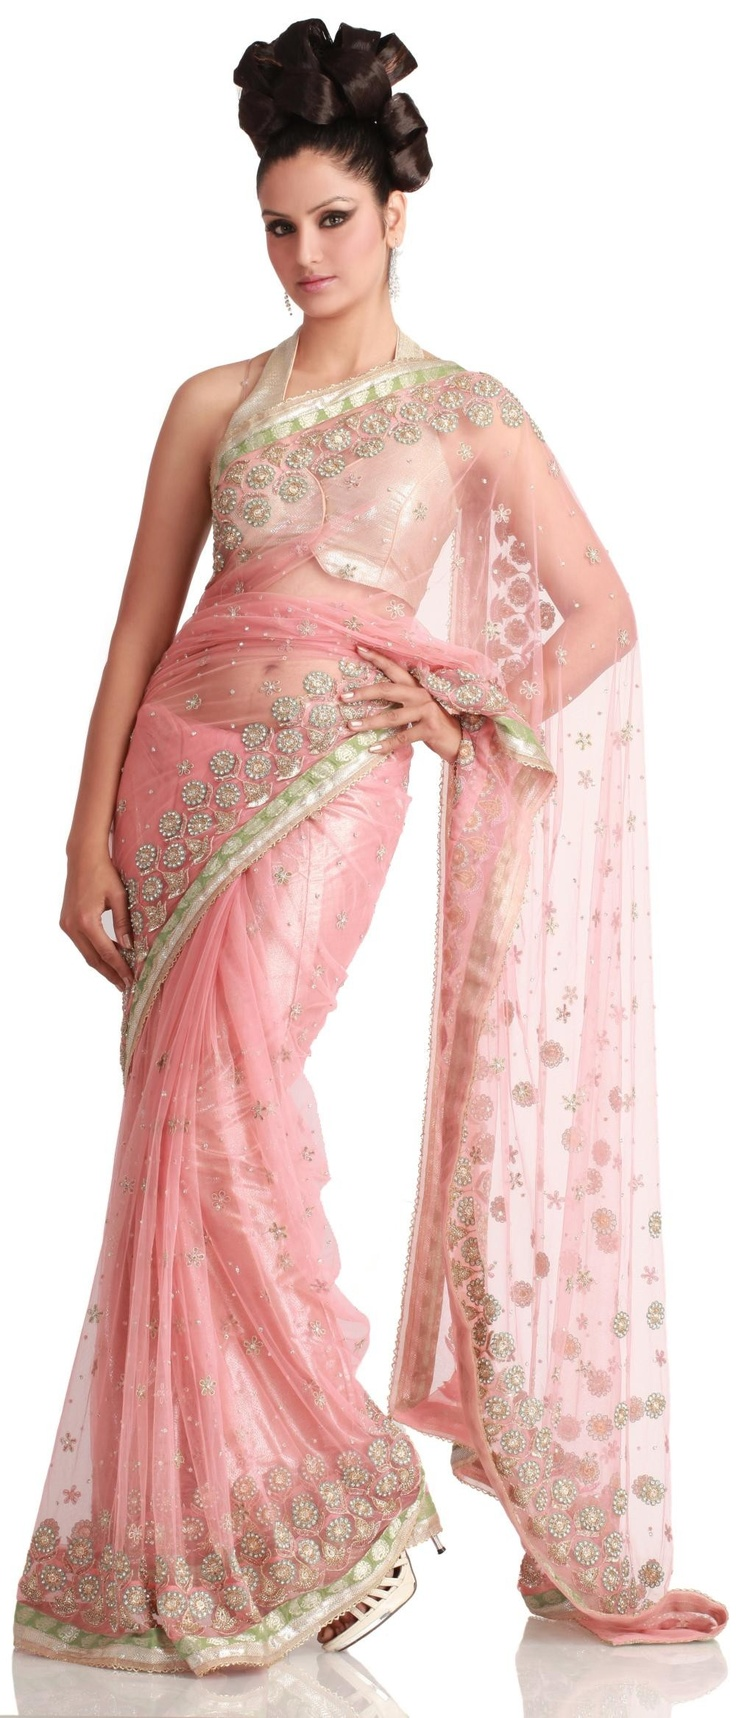 PINK NET #SAREE - Indian Designer Bridal Wear Collection @ Angarkh.com